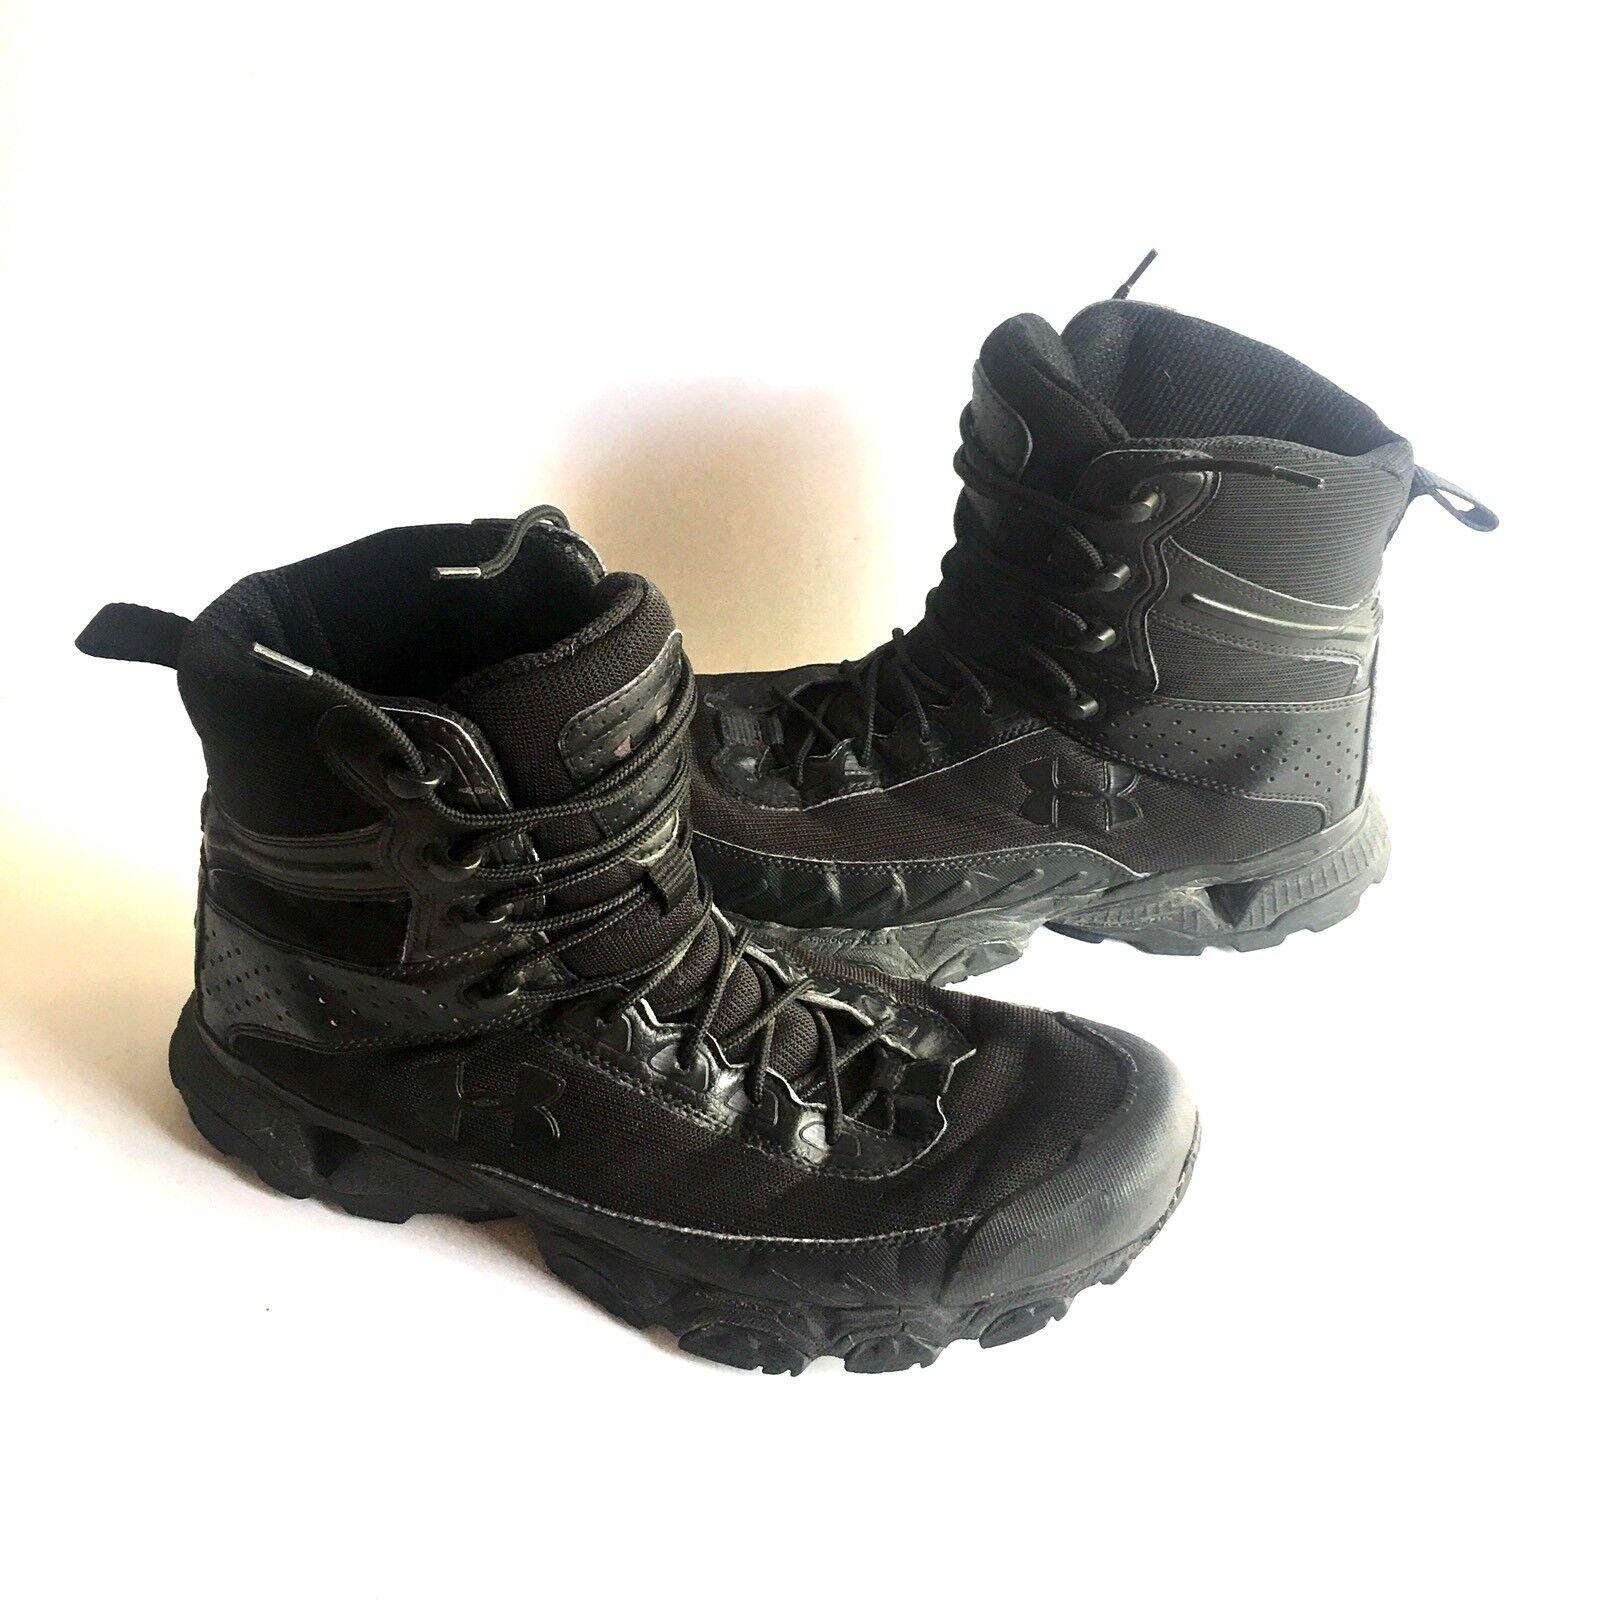 "Under Armour Valsetz Valsetz Valsetz 7"" Tactical Men's Größe 11.5 Stiefel Sold Out 3d49cf"